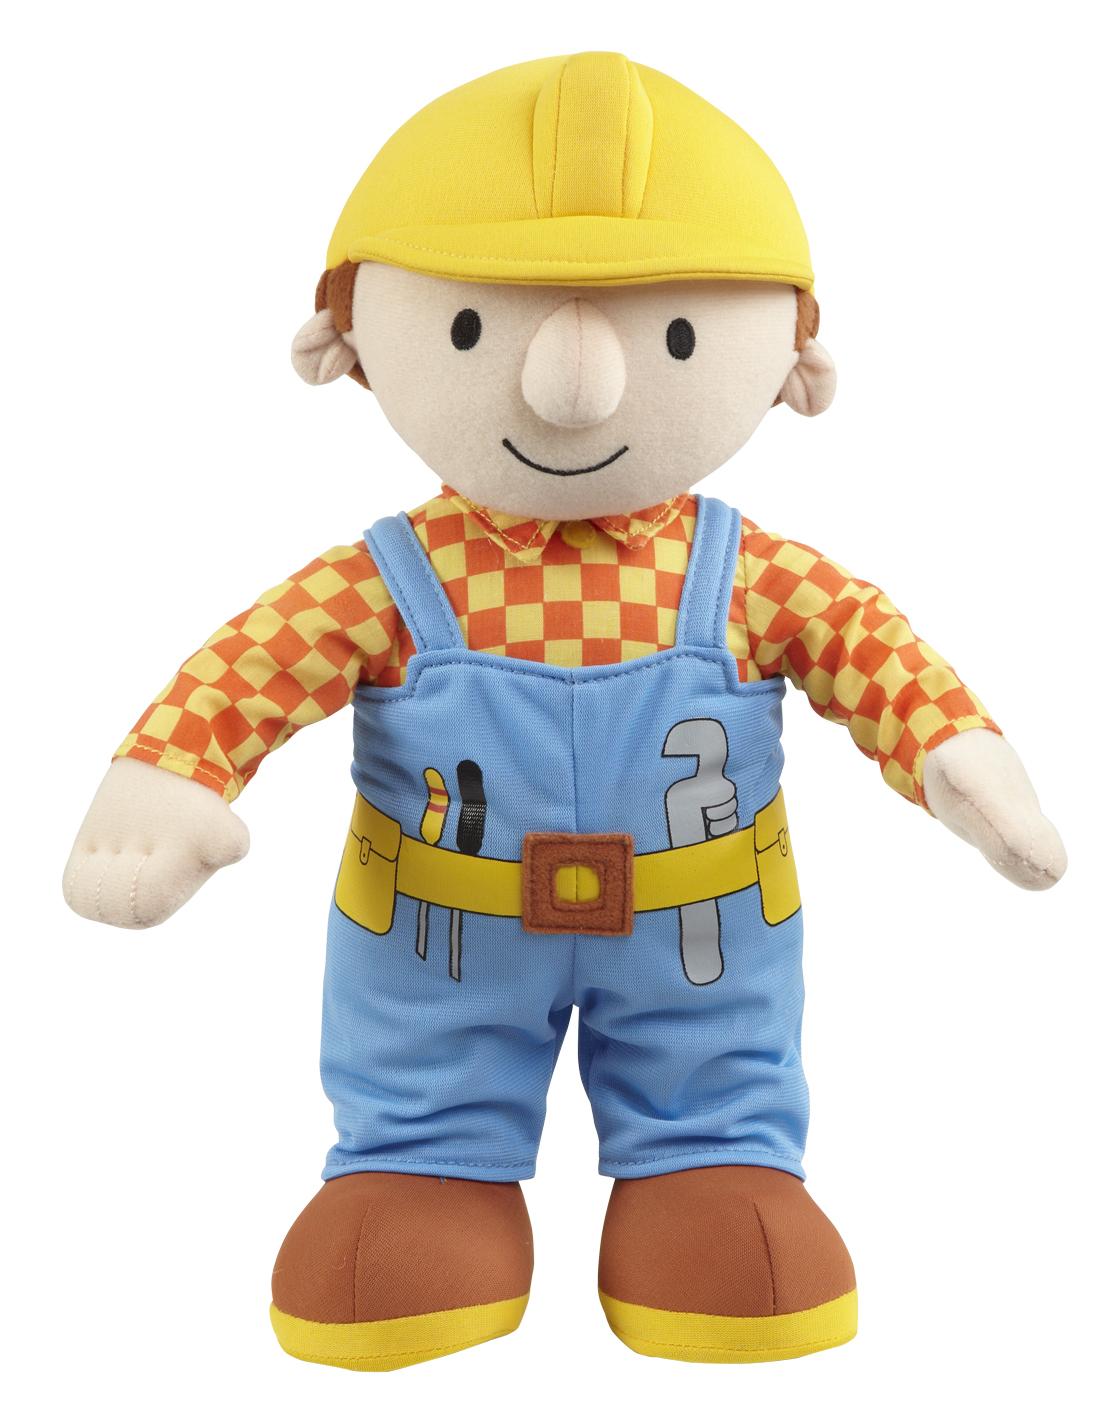 Florida Builder